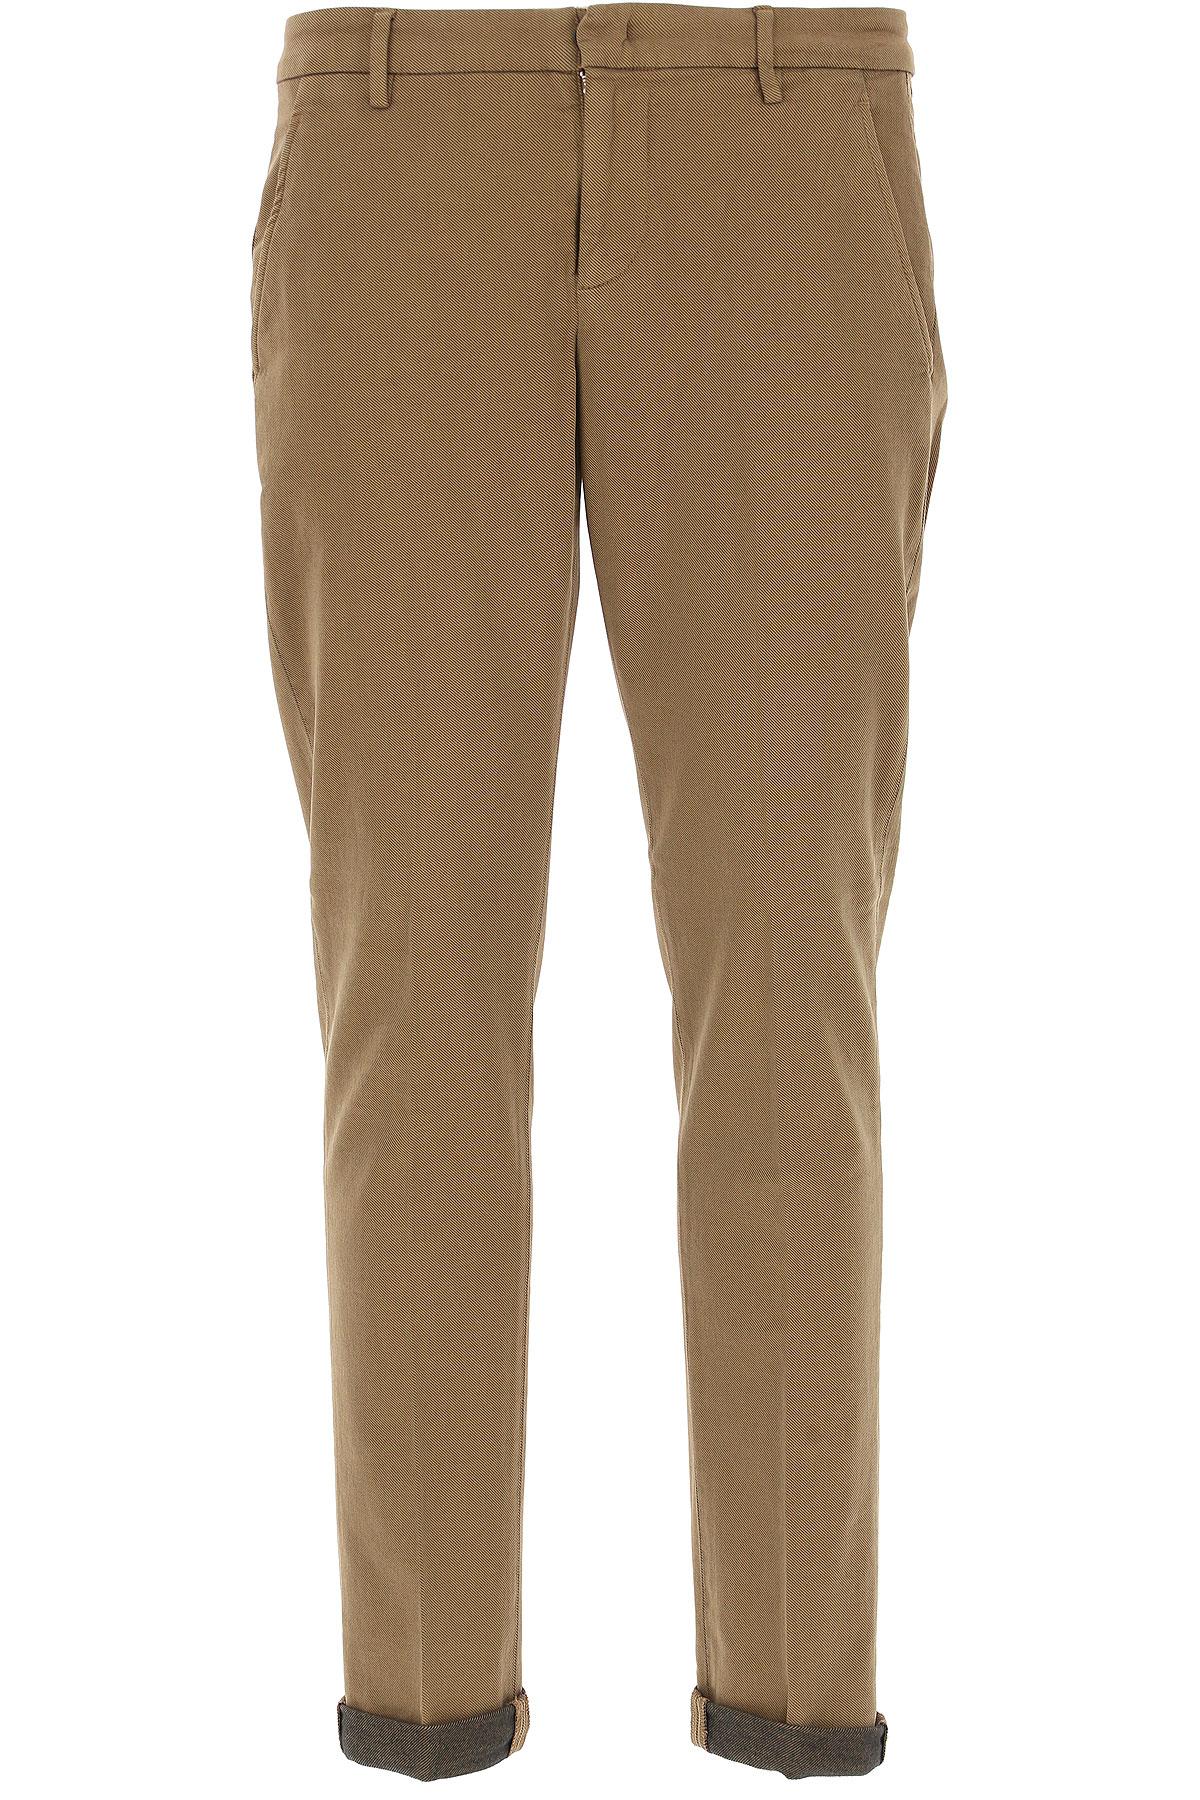 Dondup Pants for Men On Sale, Camel, Cotton, 2017, 30 31 32 33 34 35 36 38